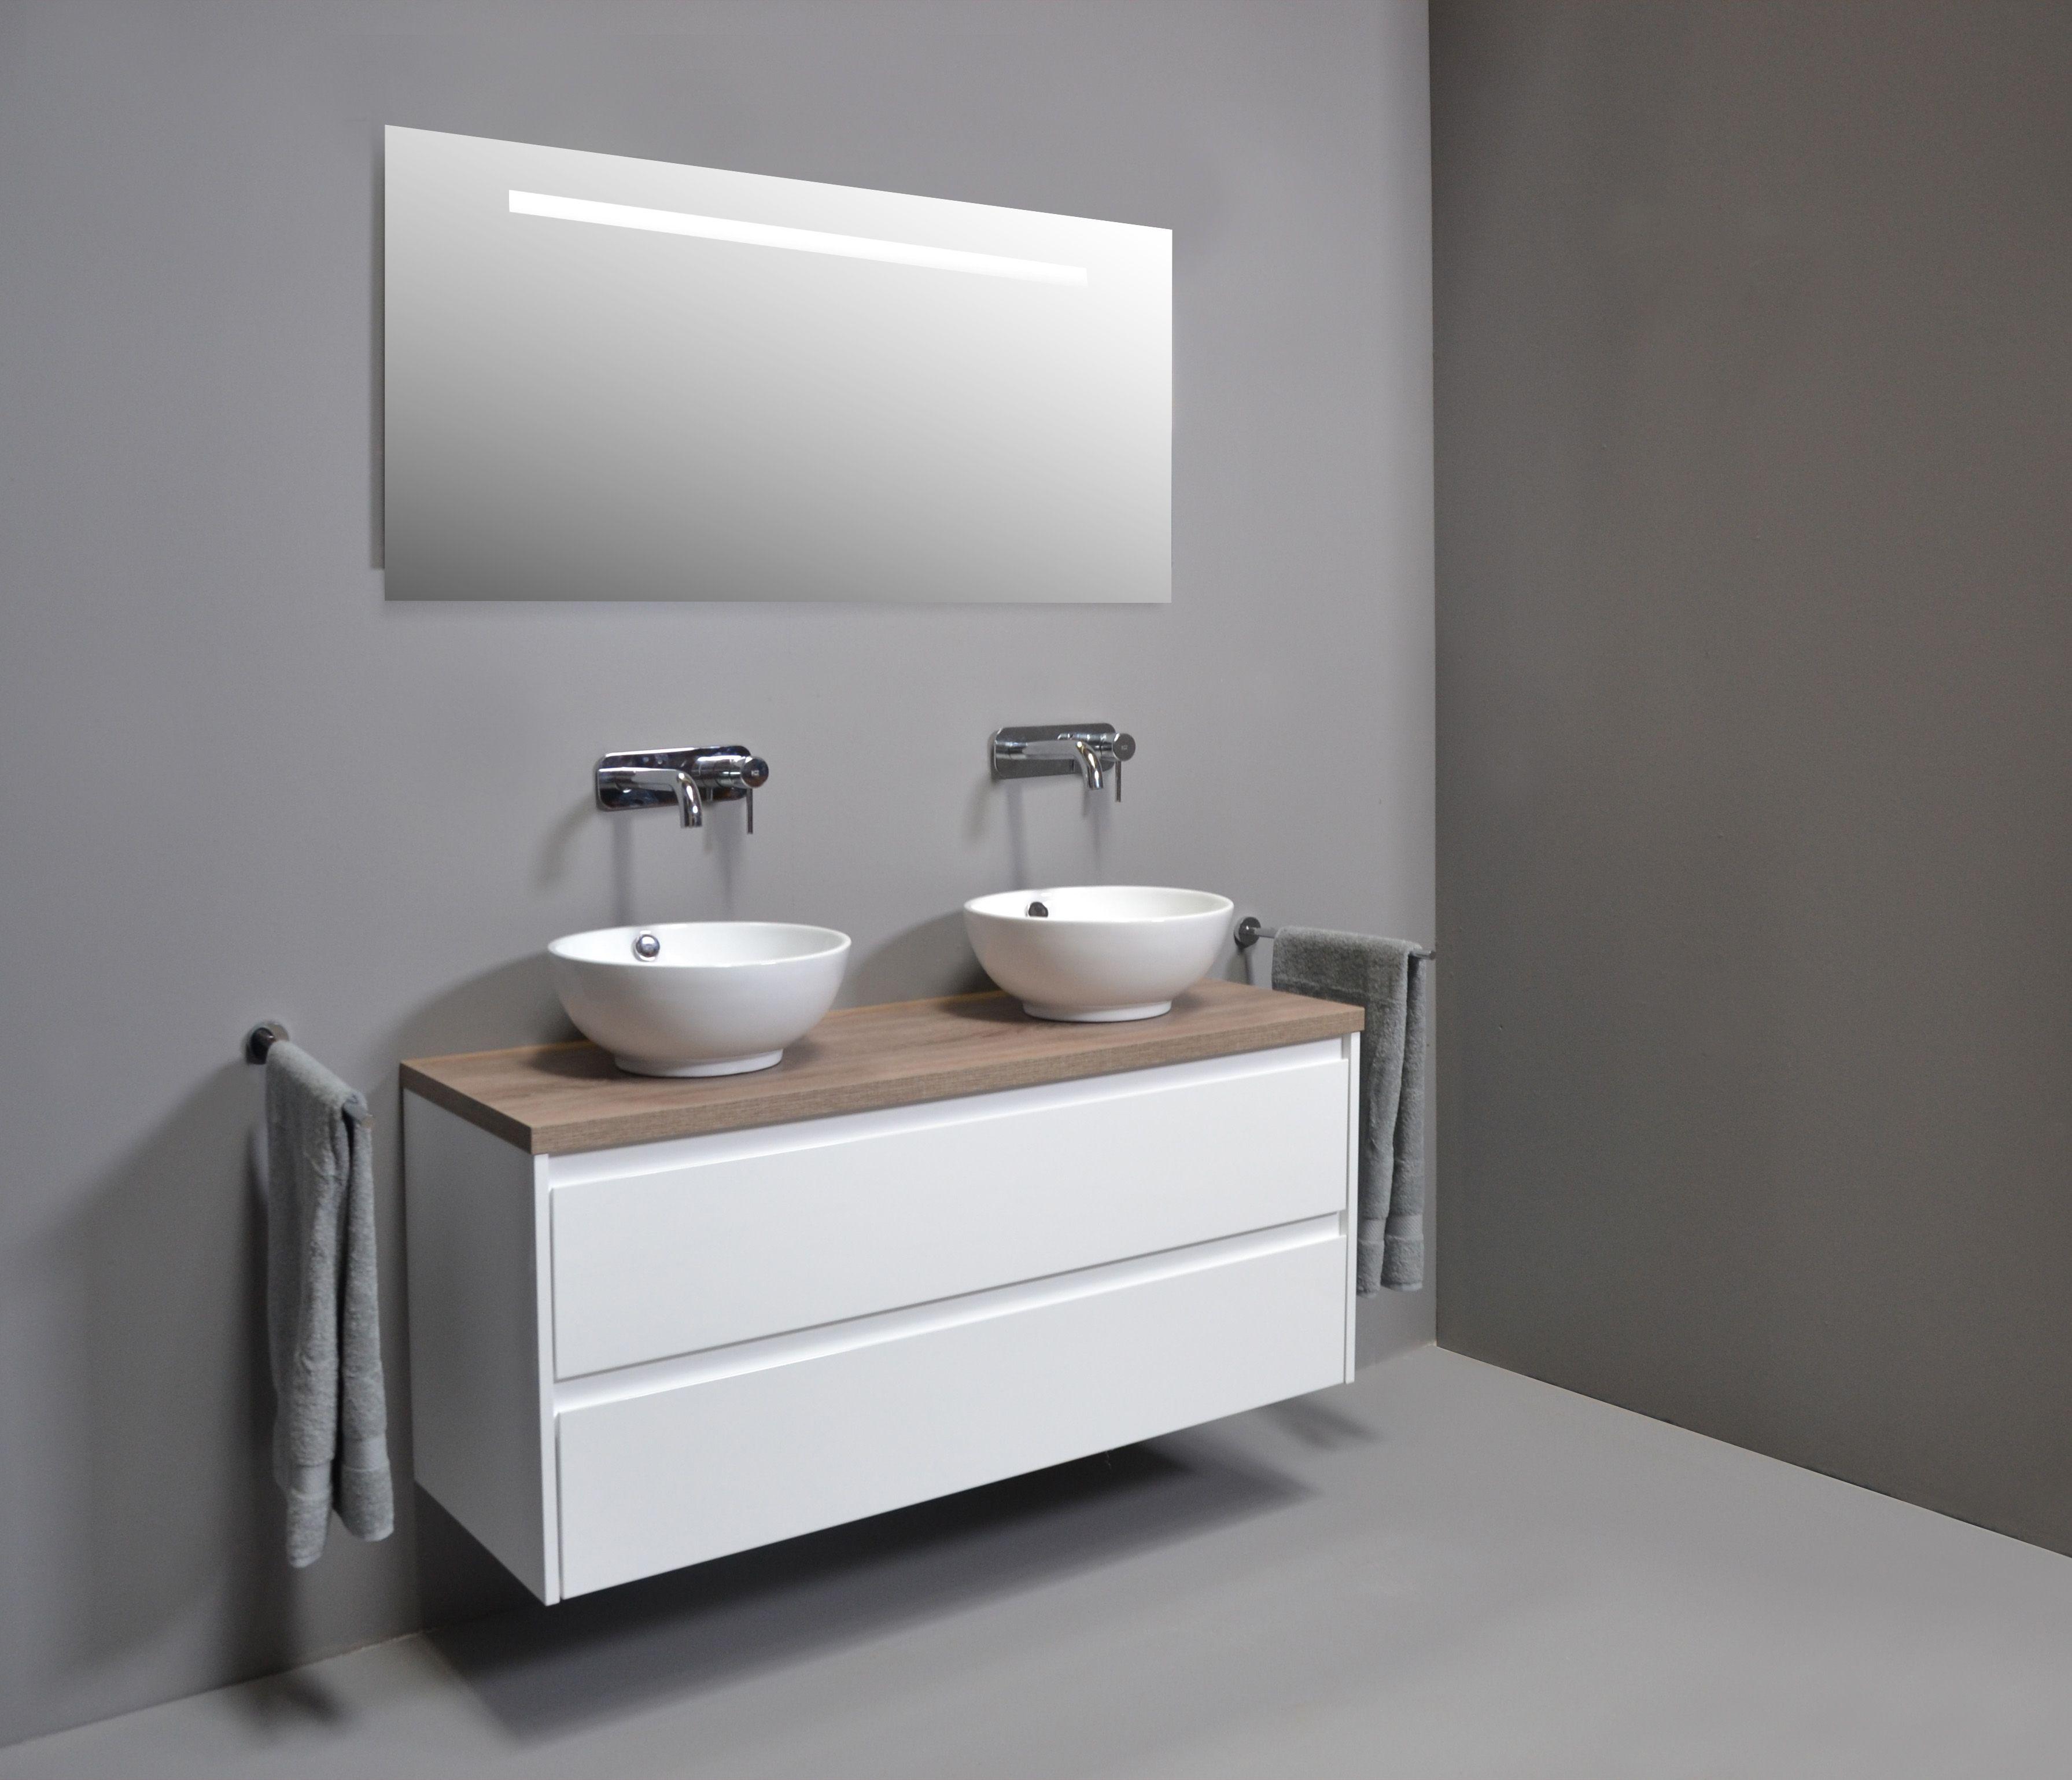 proline opbouw kom porselein hoogglans wit badkamer wastafel